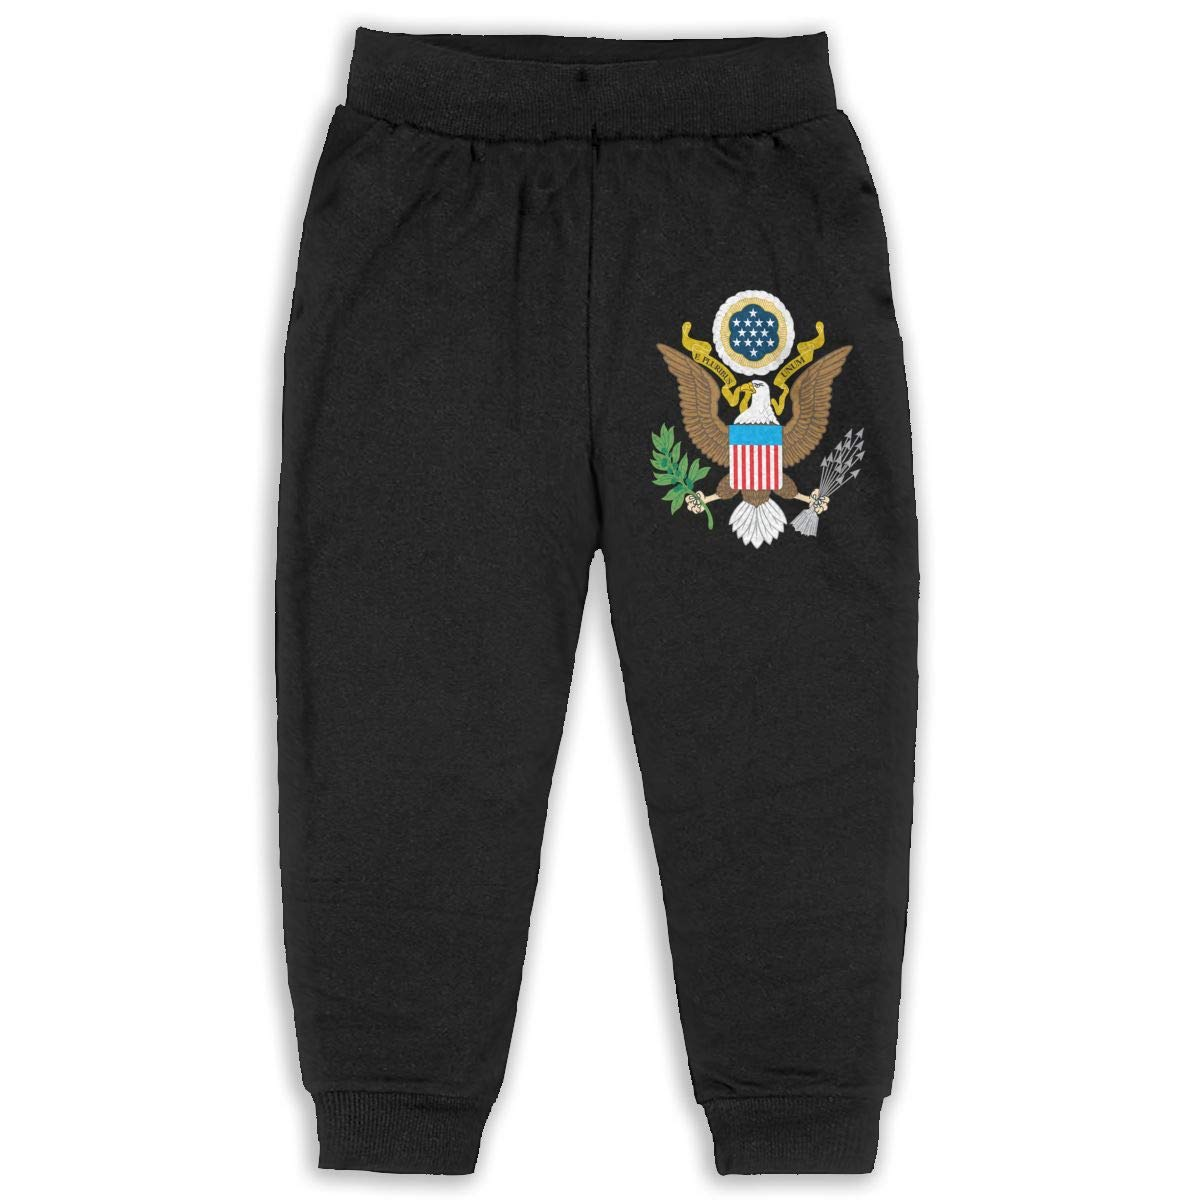 DaXi1 Seal Sweatpants for Boys /& Girls Fleece Active Joggers Elastic Pants